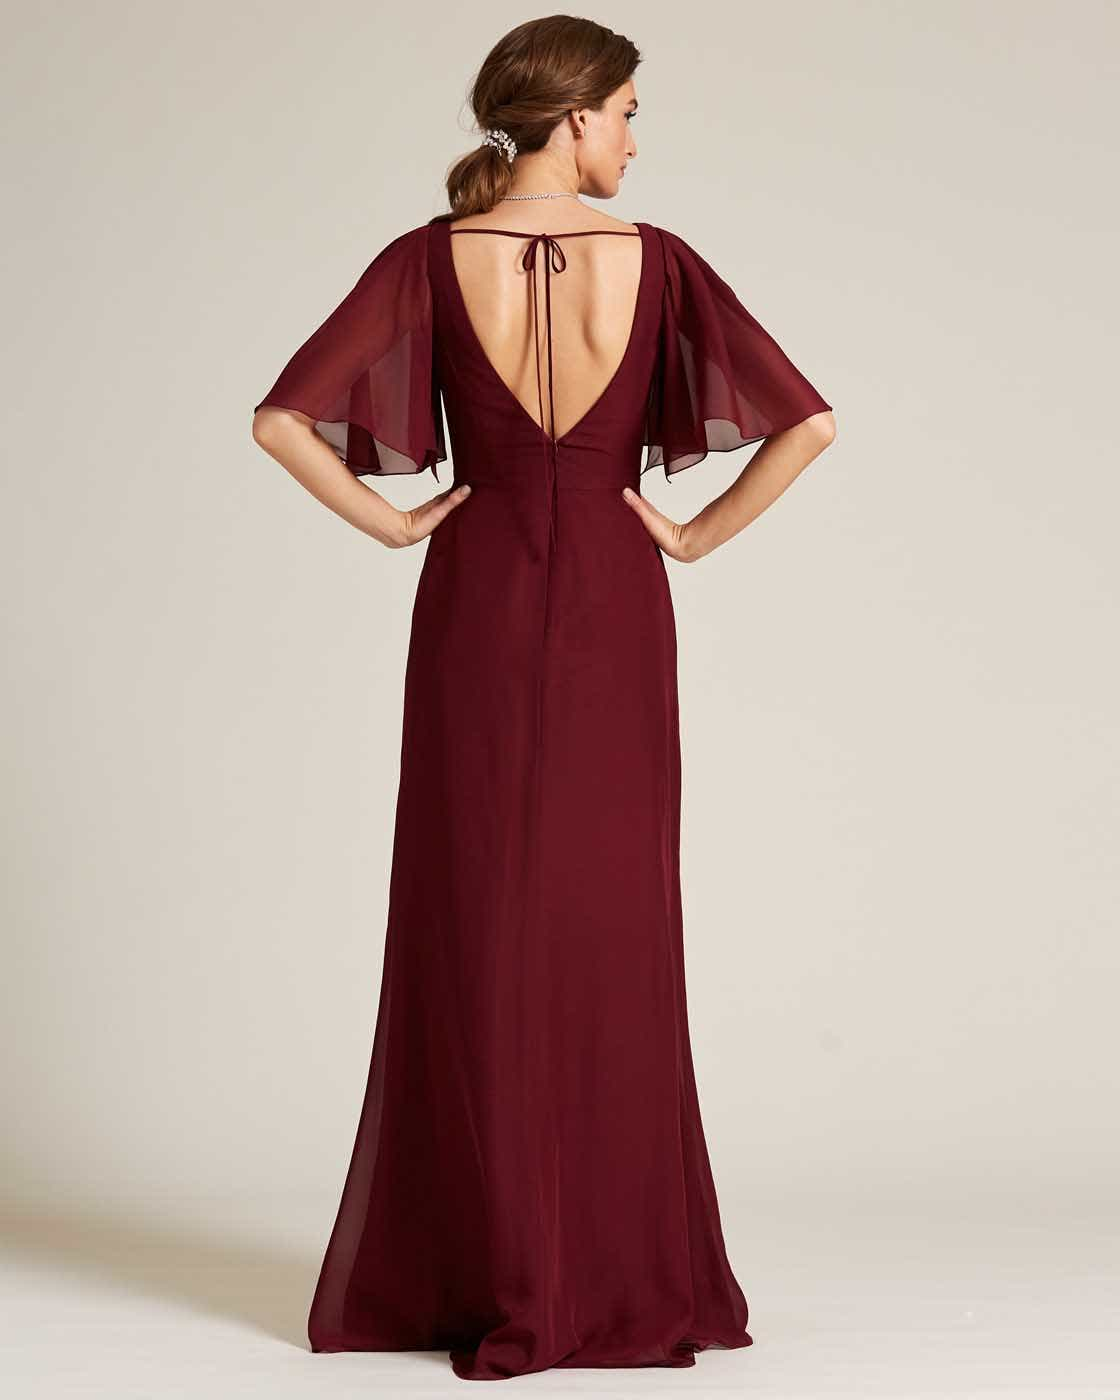 Burgundy Bell Cap Sleeve Gown - Back